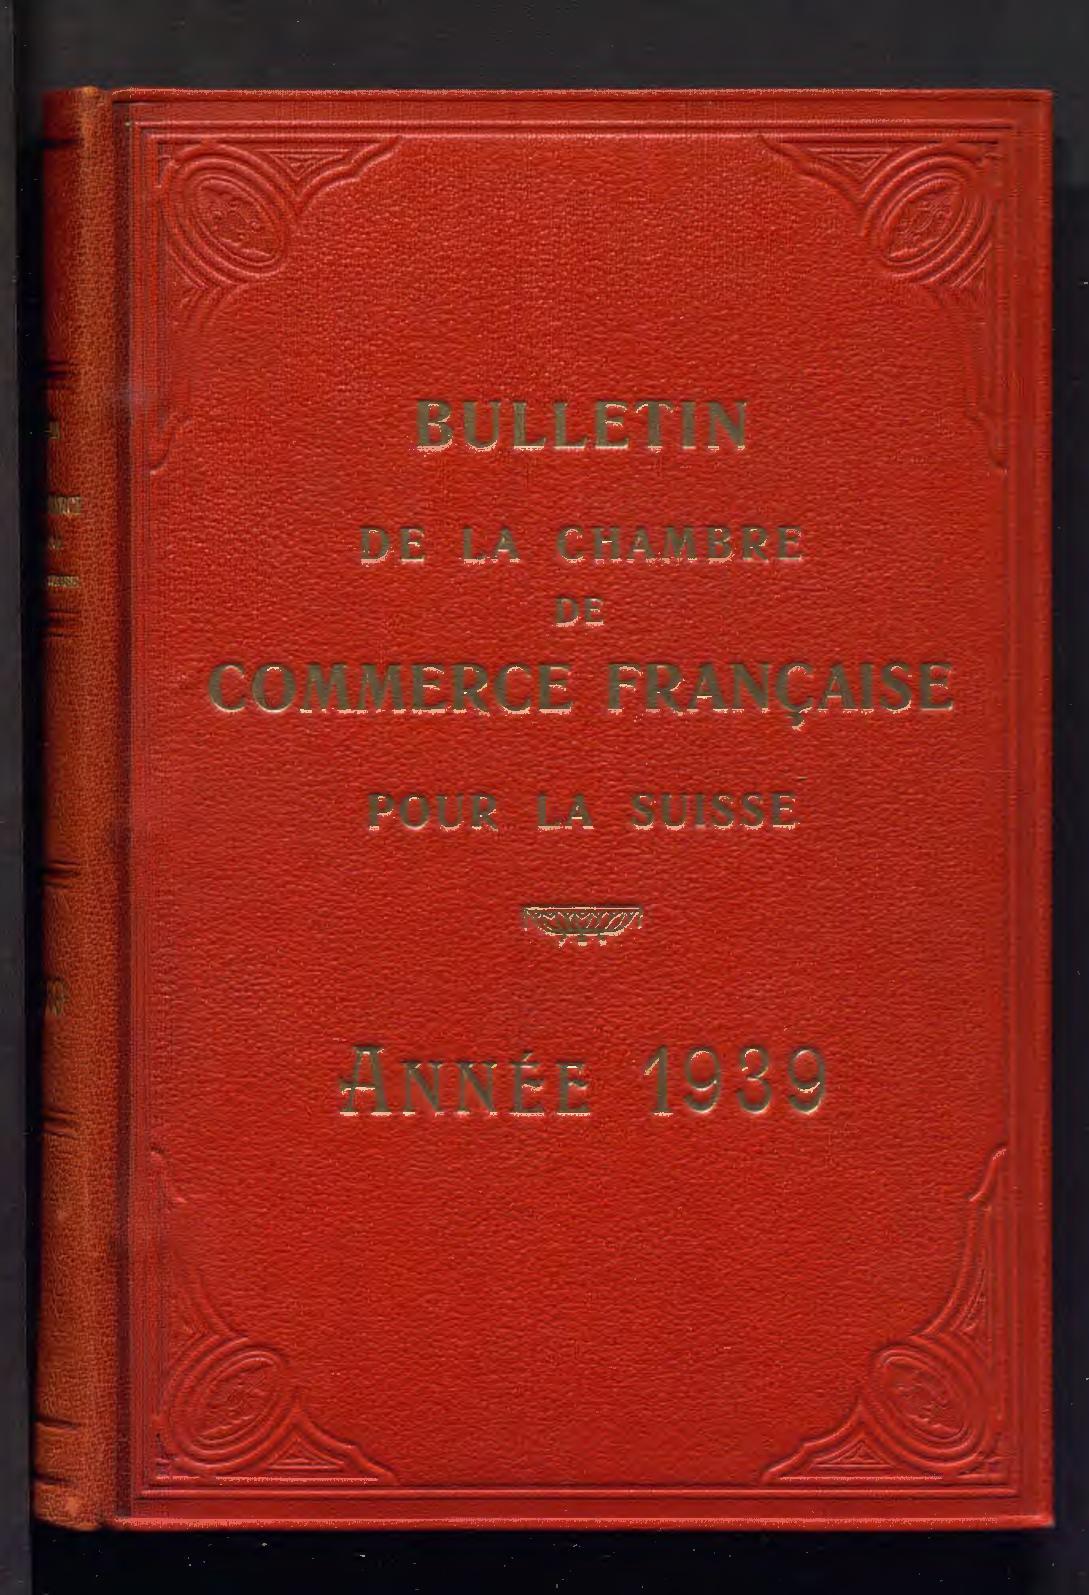 DMC Bloqué Coton 519-728 Buy 5 Get 1 Gratuit